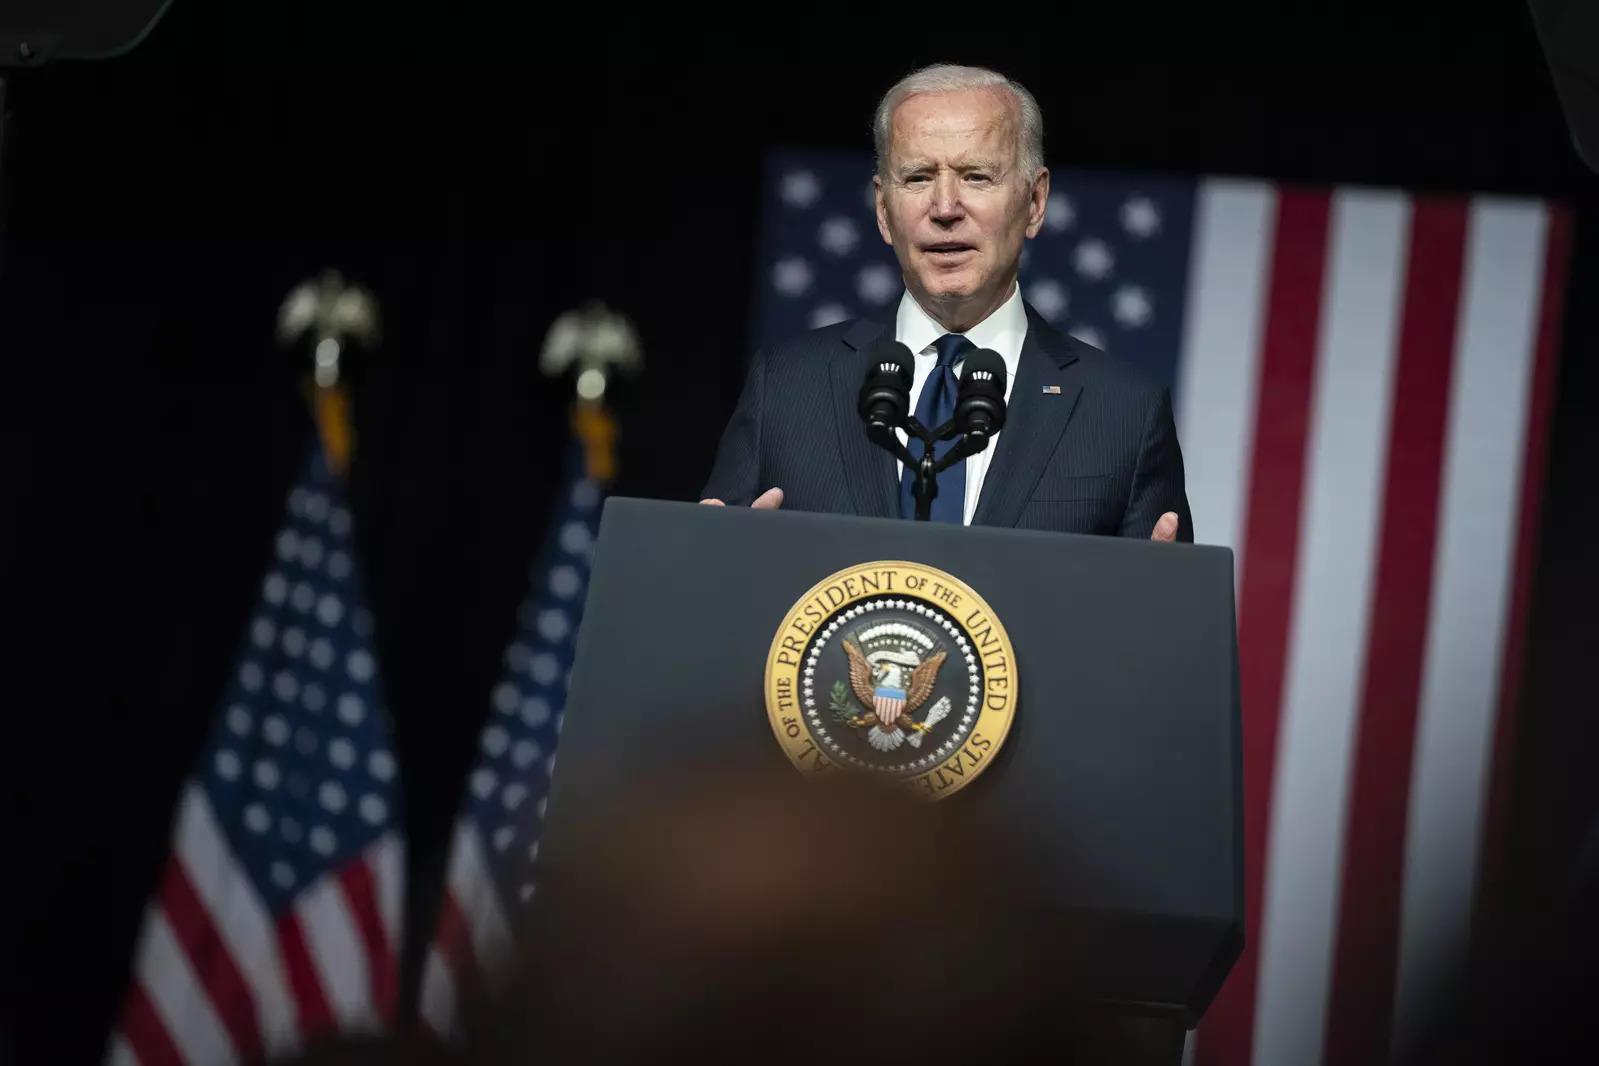 Go green or go bipartisan? Joe Biden's big infrastructure choice